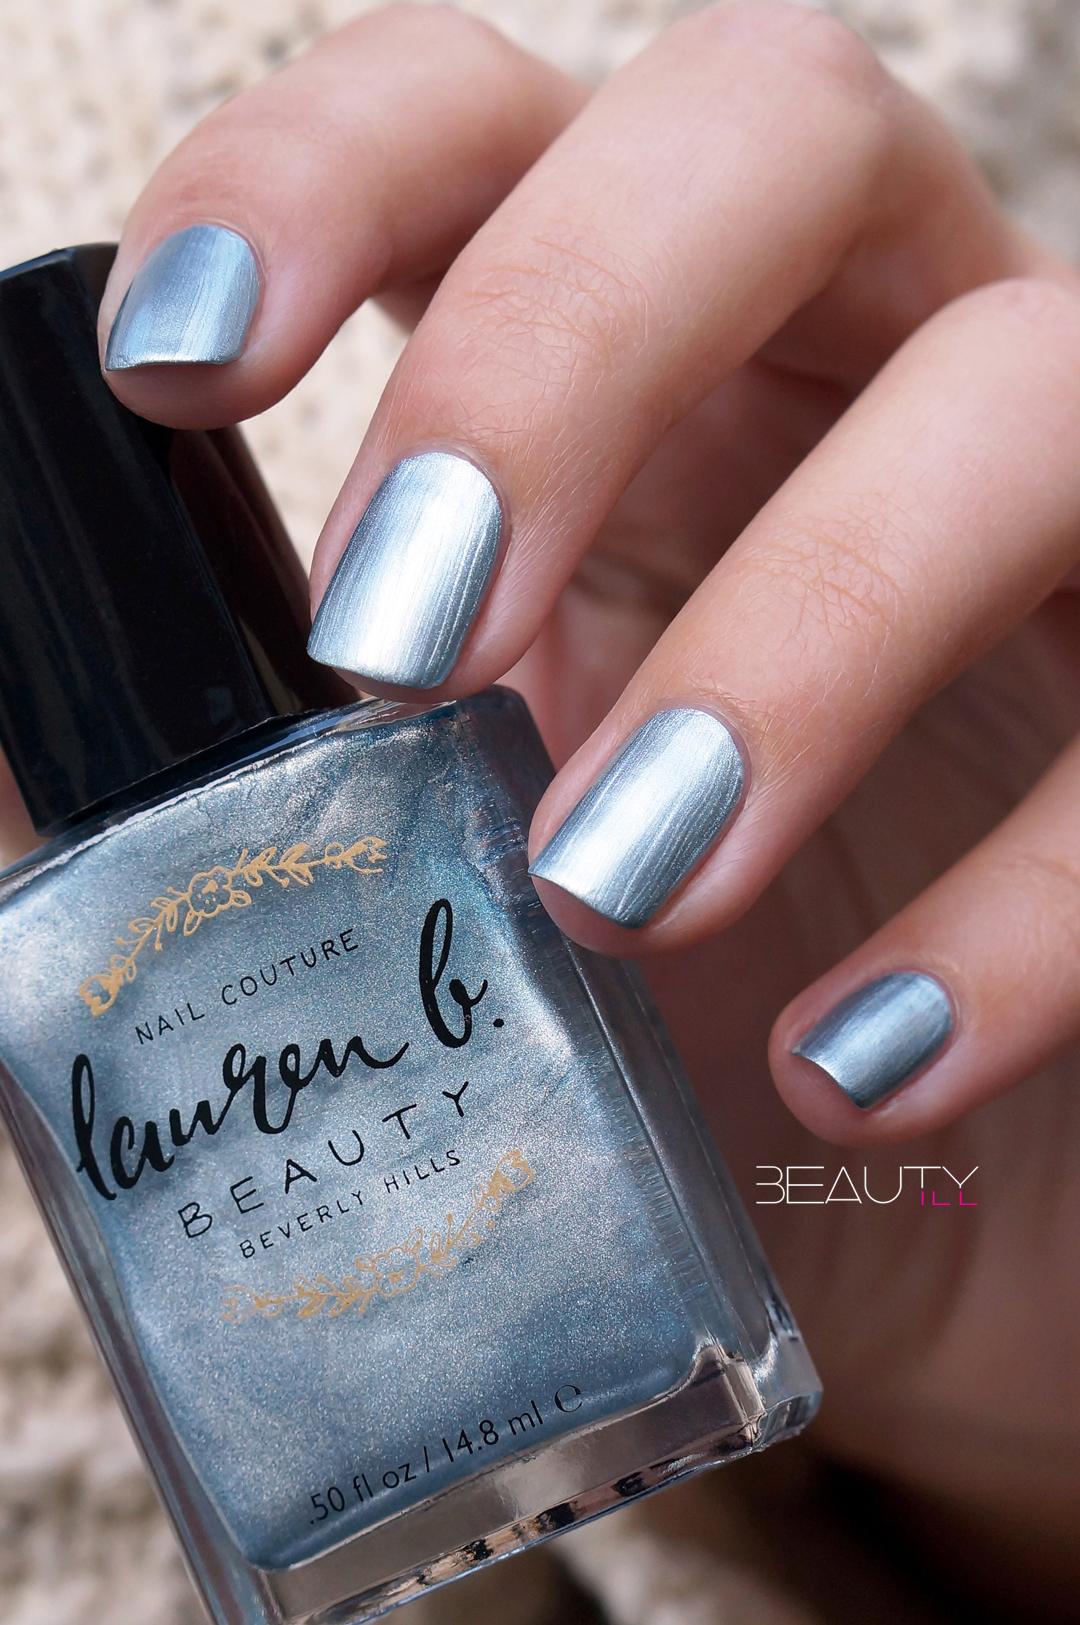 Lauren B. Beauty Silver Lake Speakeasy & Espresso On Third